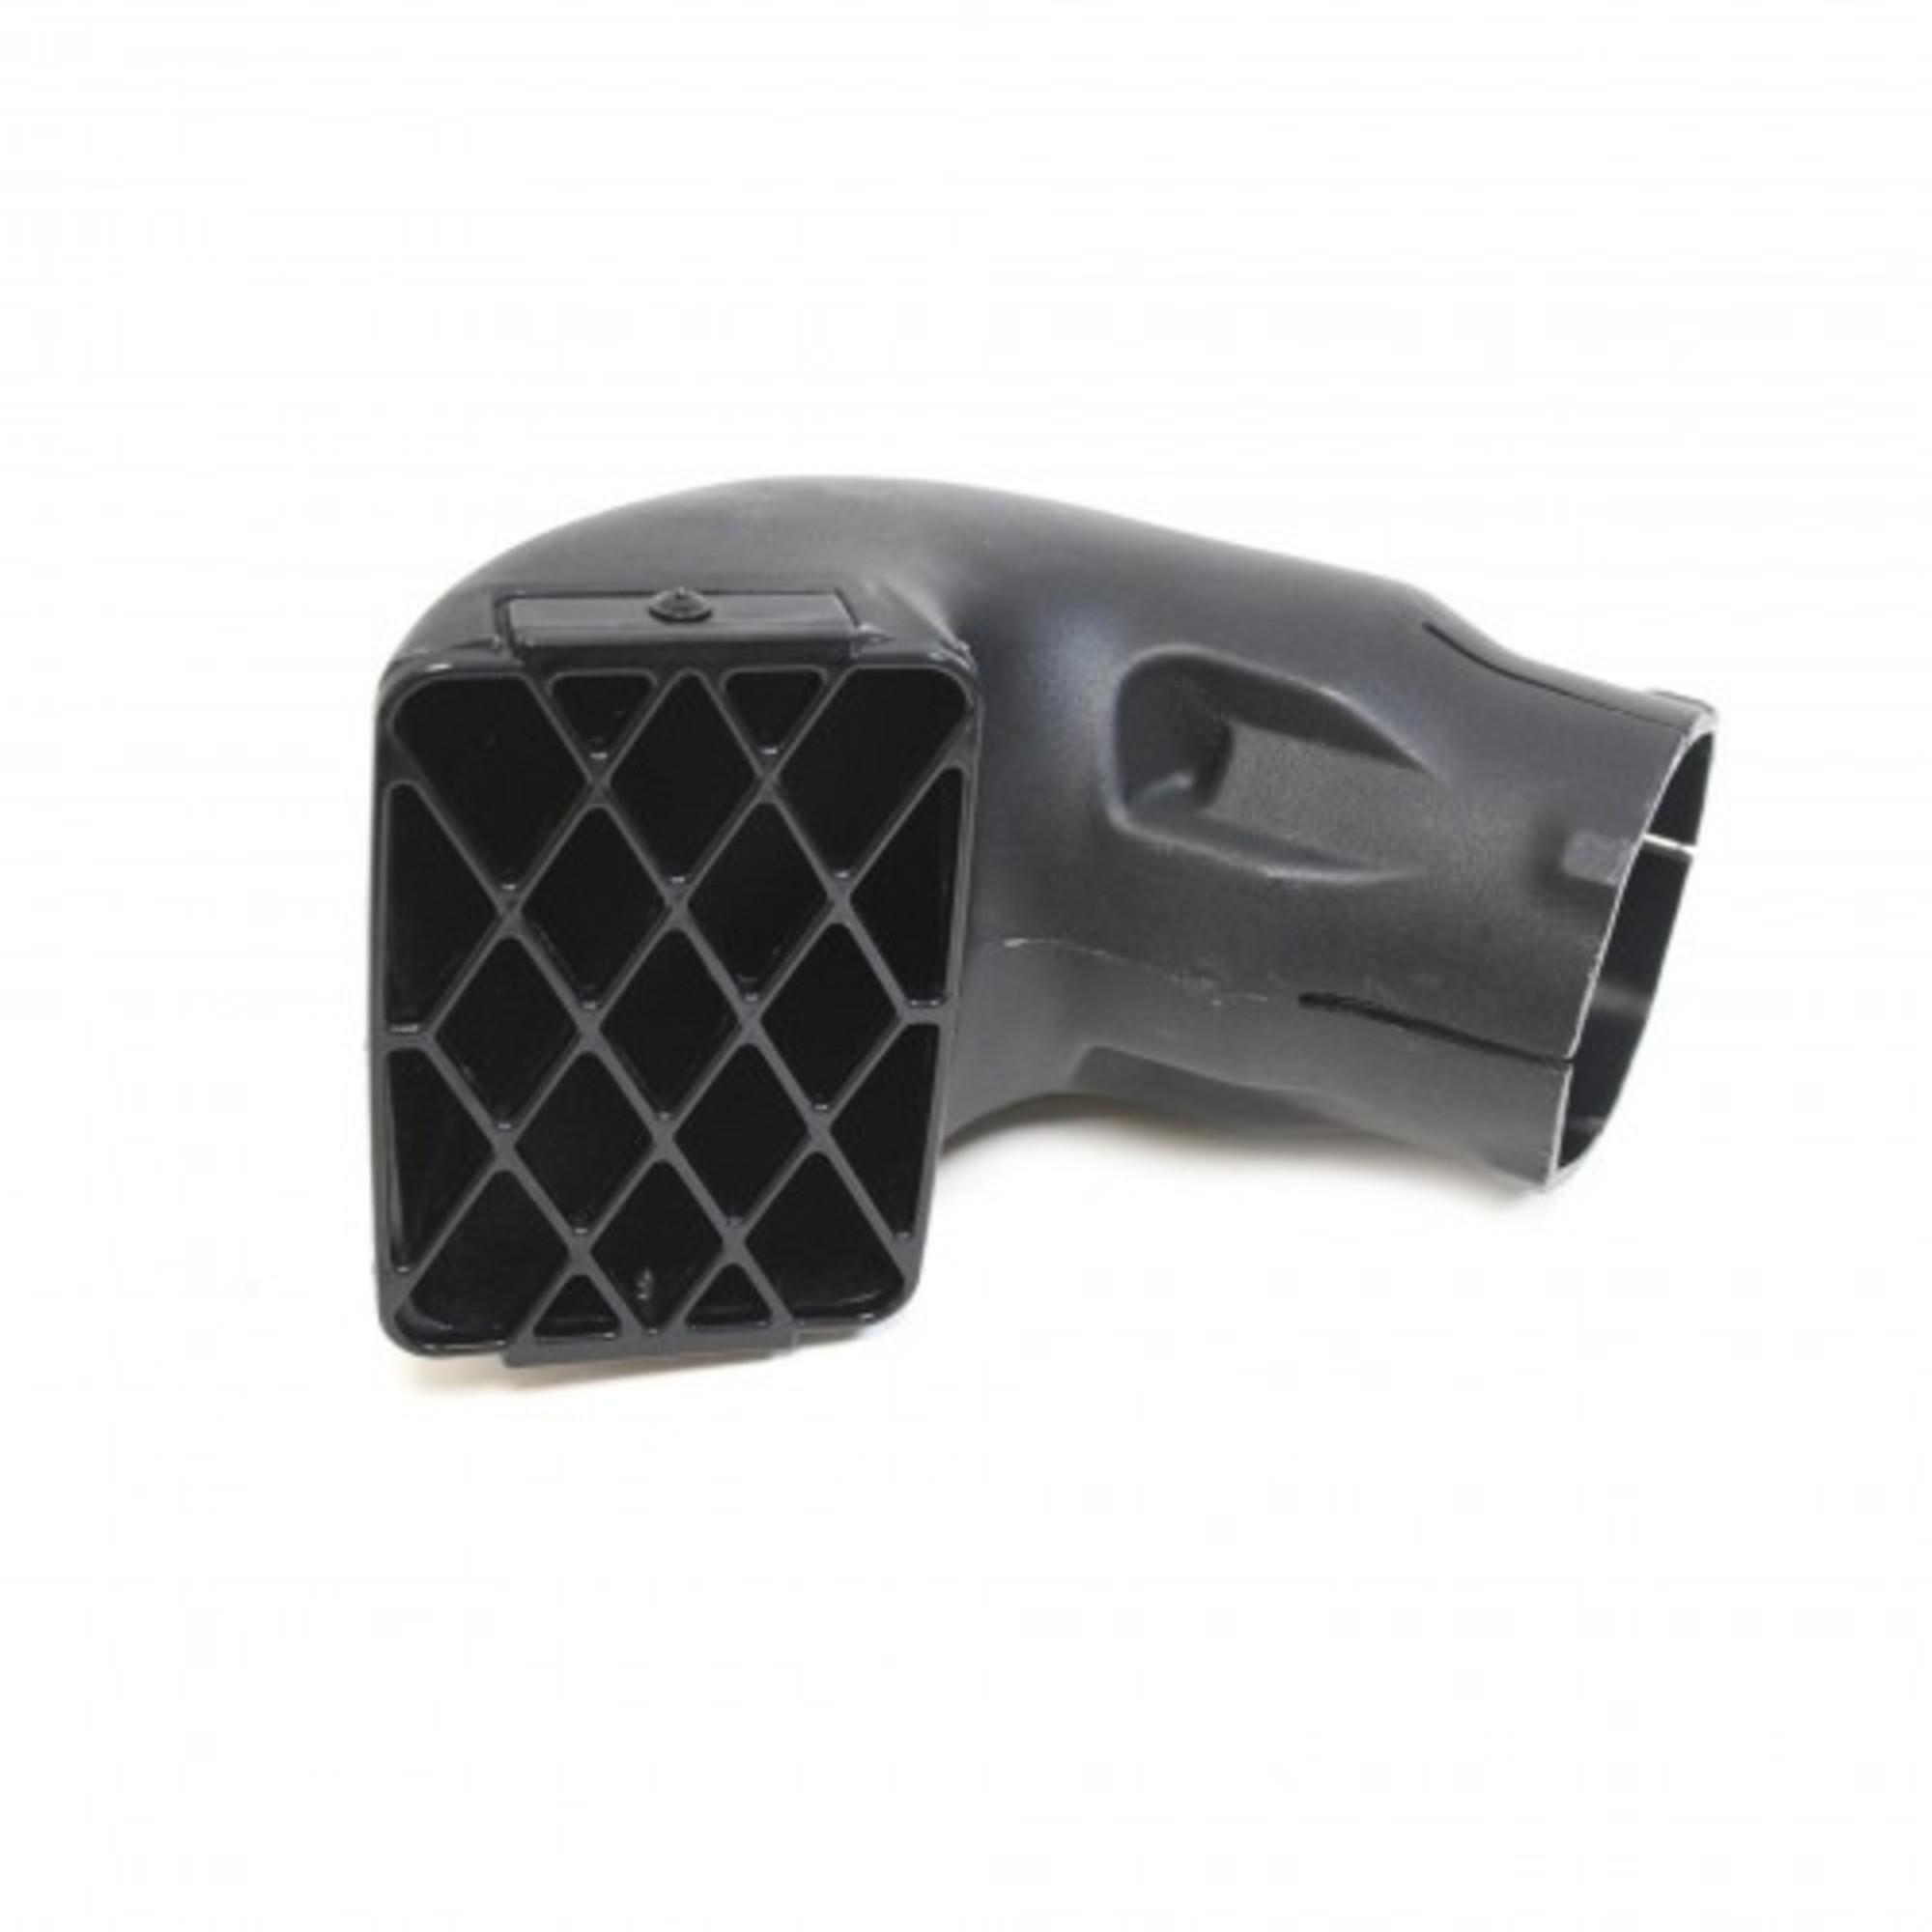 Воздухозаборник шноркеля УАЗ-ПАТРИОТ (СПРУТ)